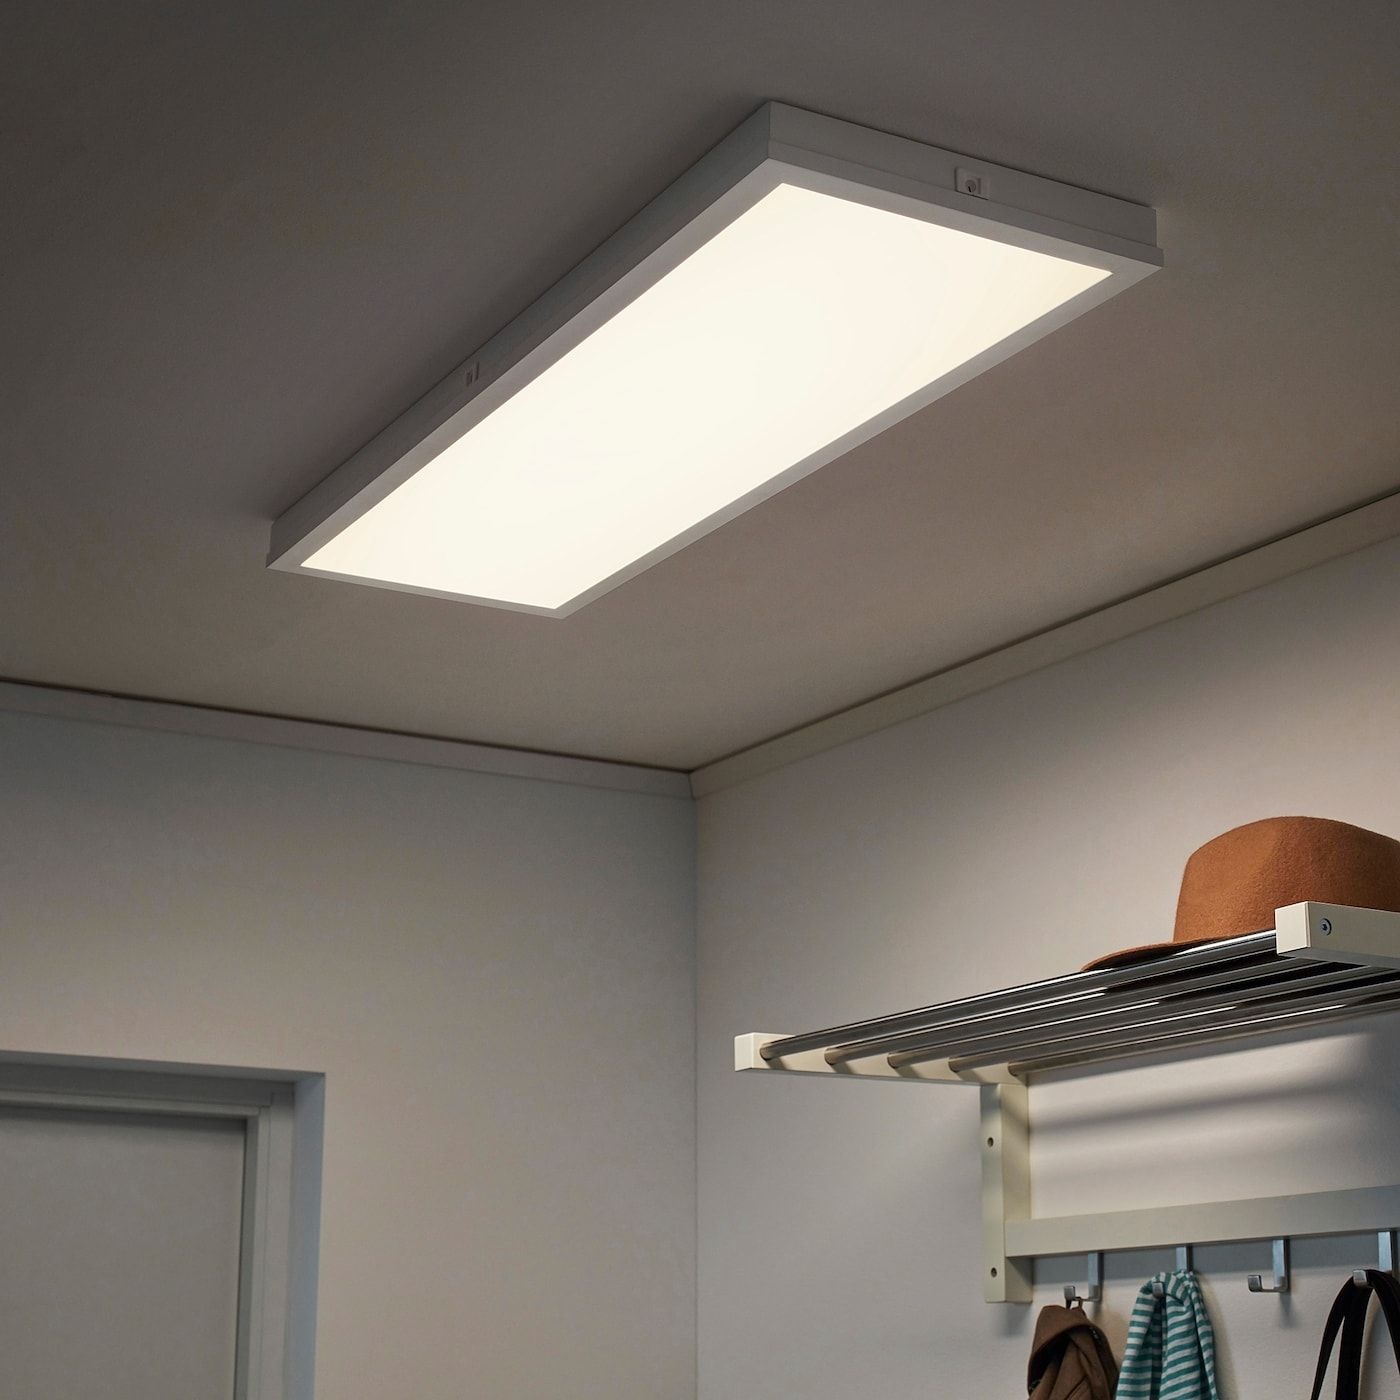 Floalt Panneau Eclairage Del Intensite Lumineuse Reglable Spectre Blanc 30x90cm Ca Fr Ikea In 2021 Led Panel Light Led Lights Light Panel